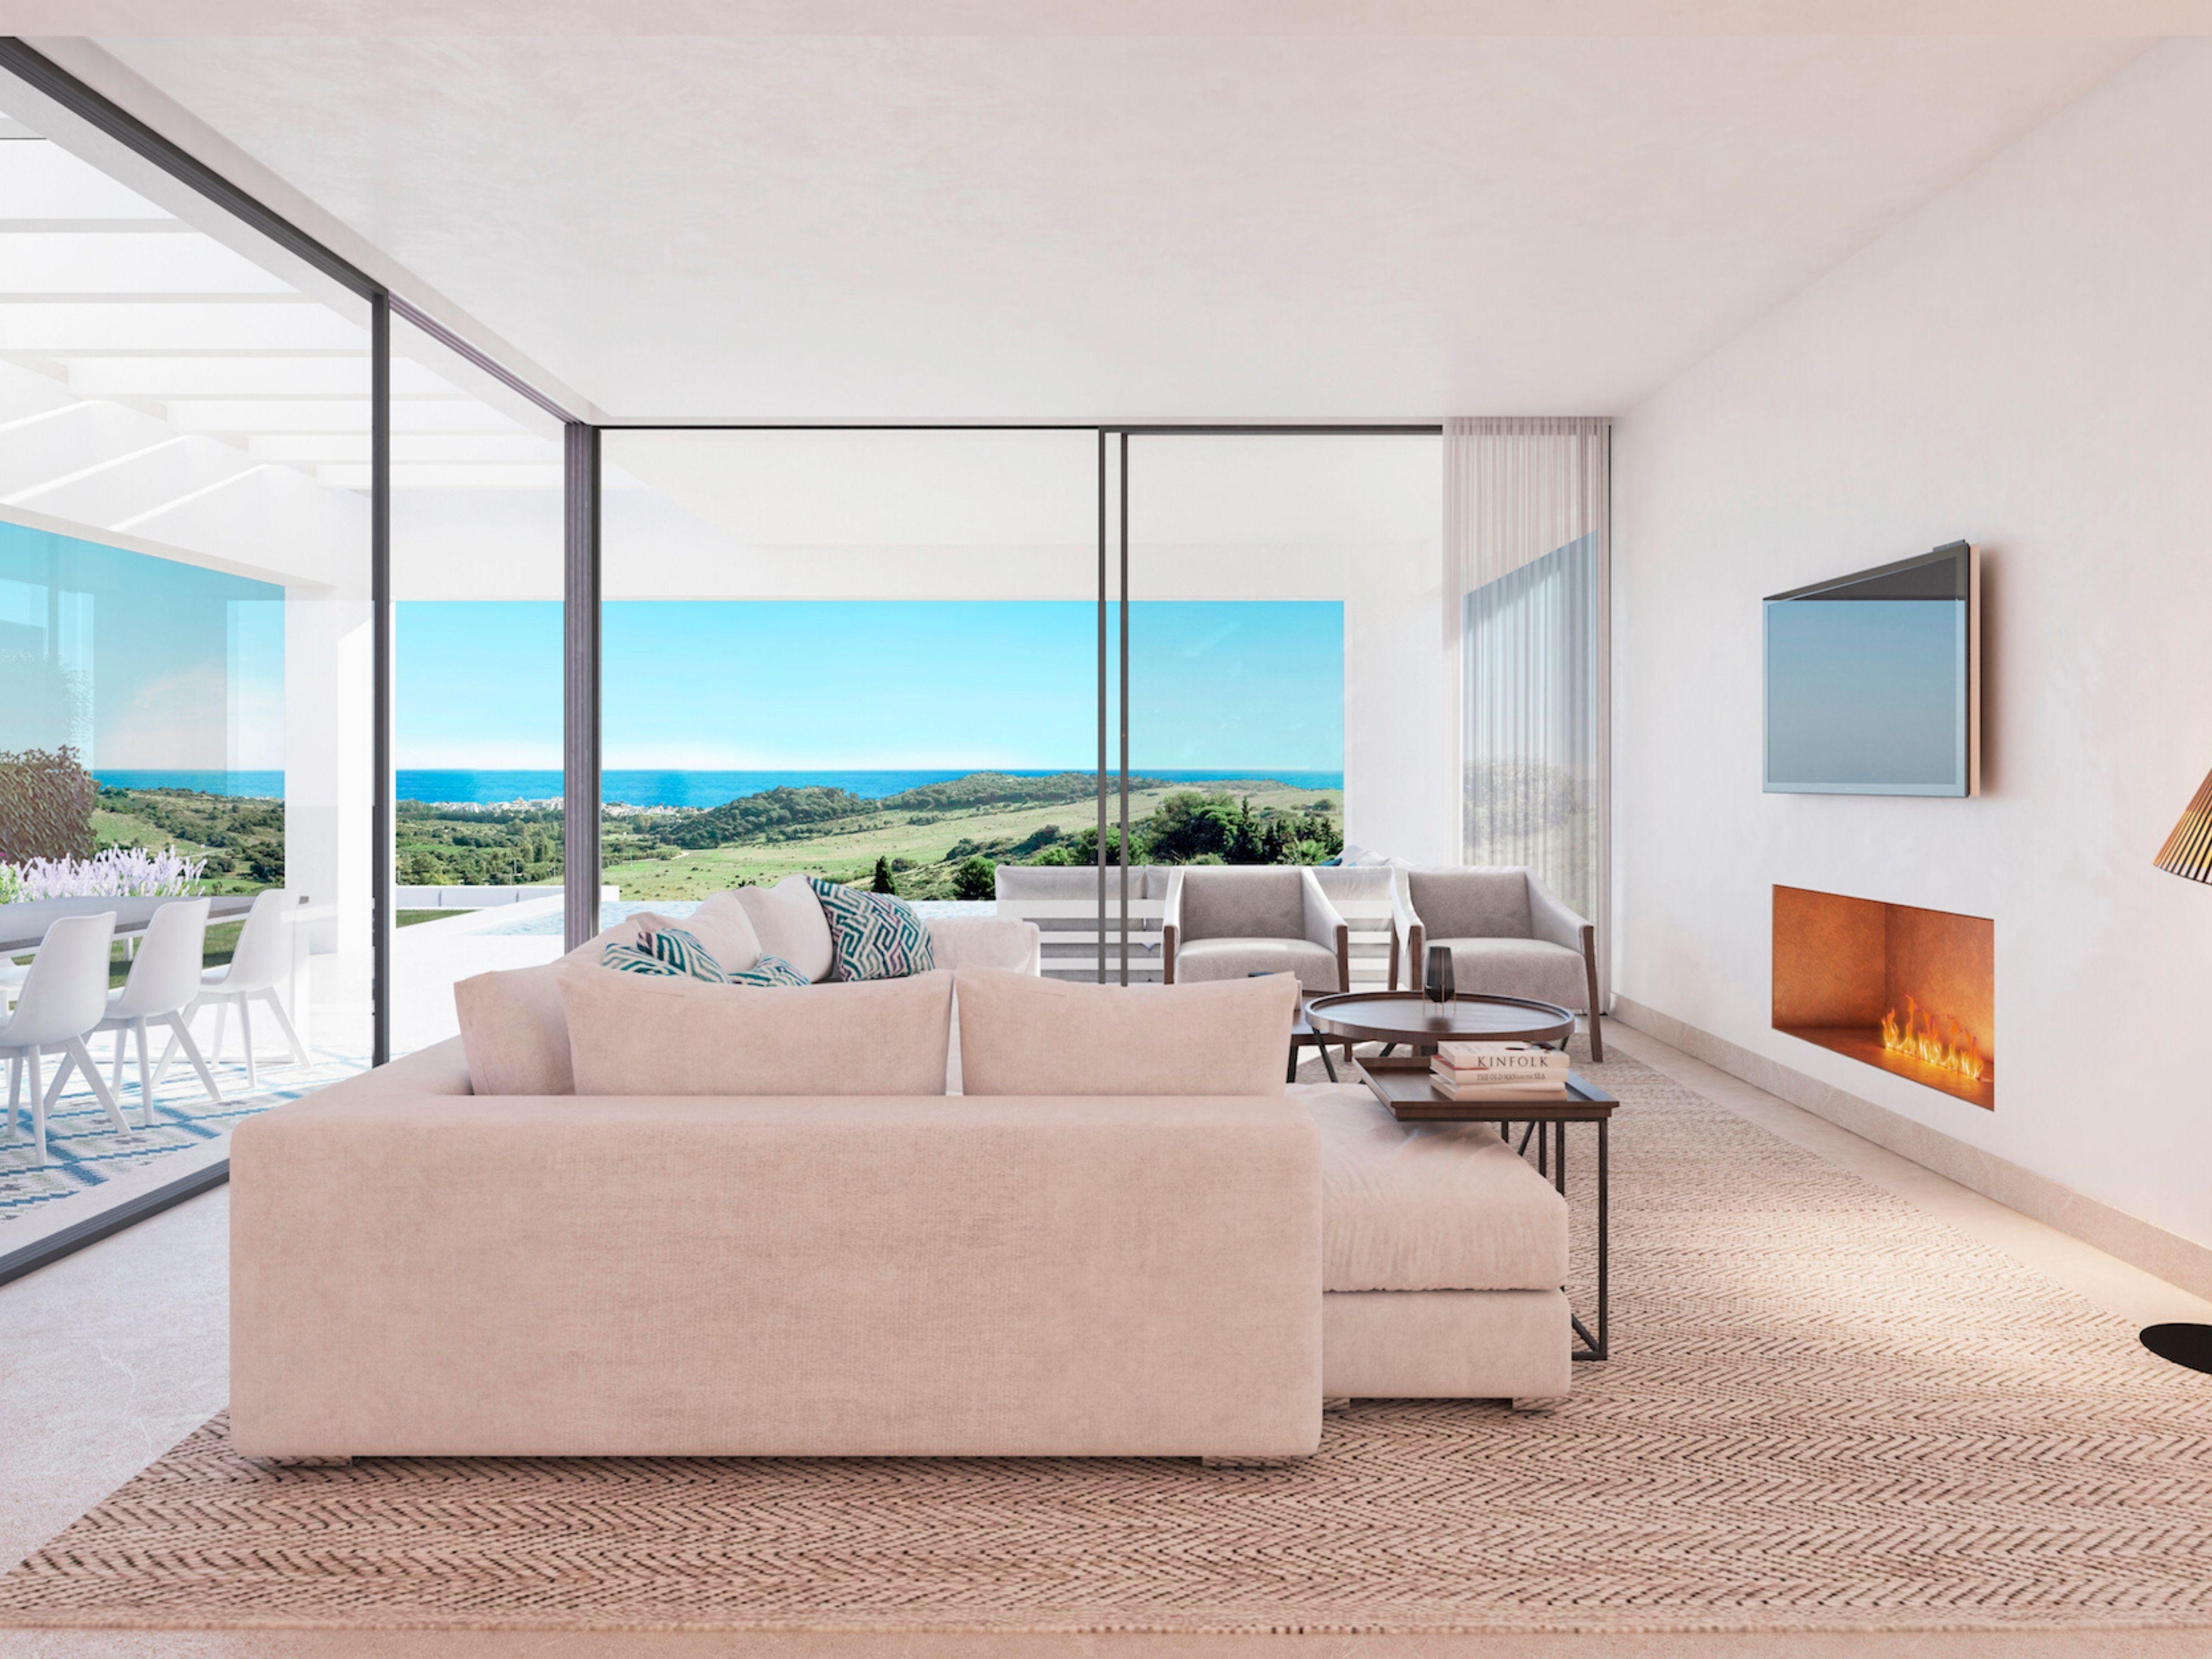 Luxury villas in the heart of Estepona Golf